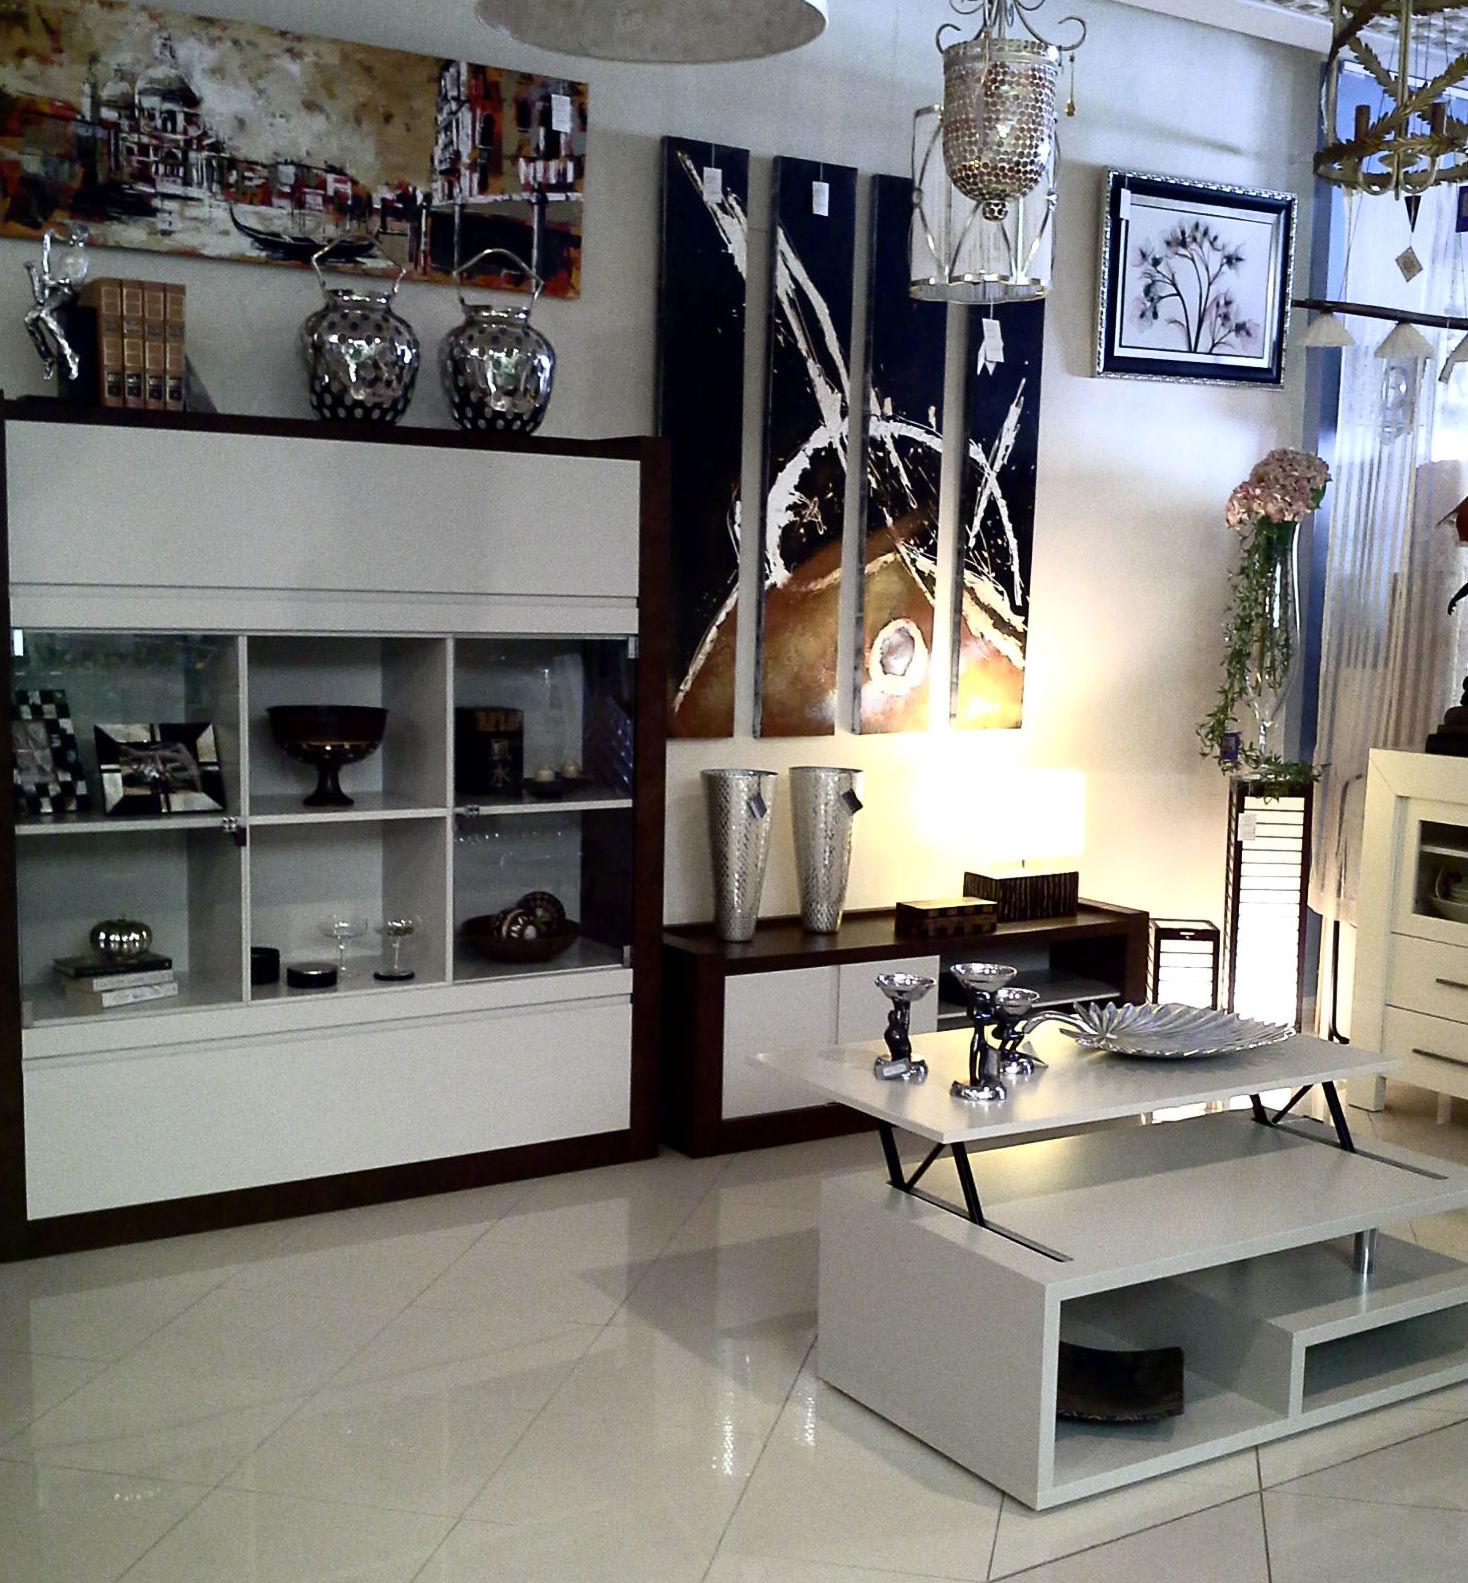 15 De Muebles Y Decoraci N En El Alqui N Muebles Francisco Mart Nez # Muebles Martinez